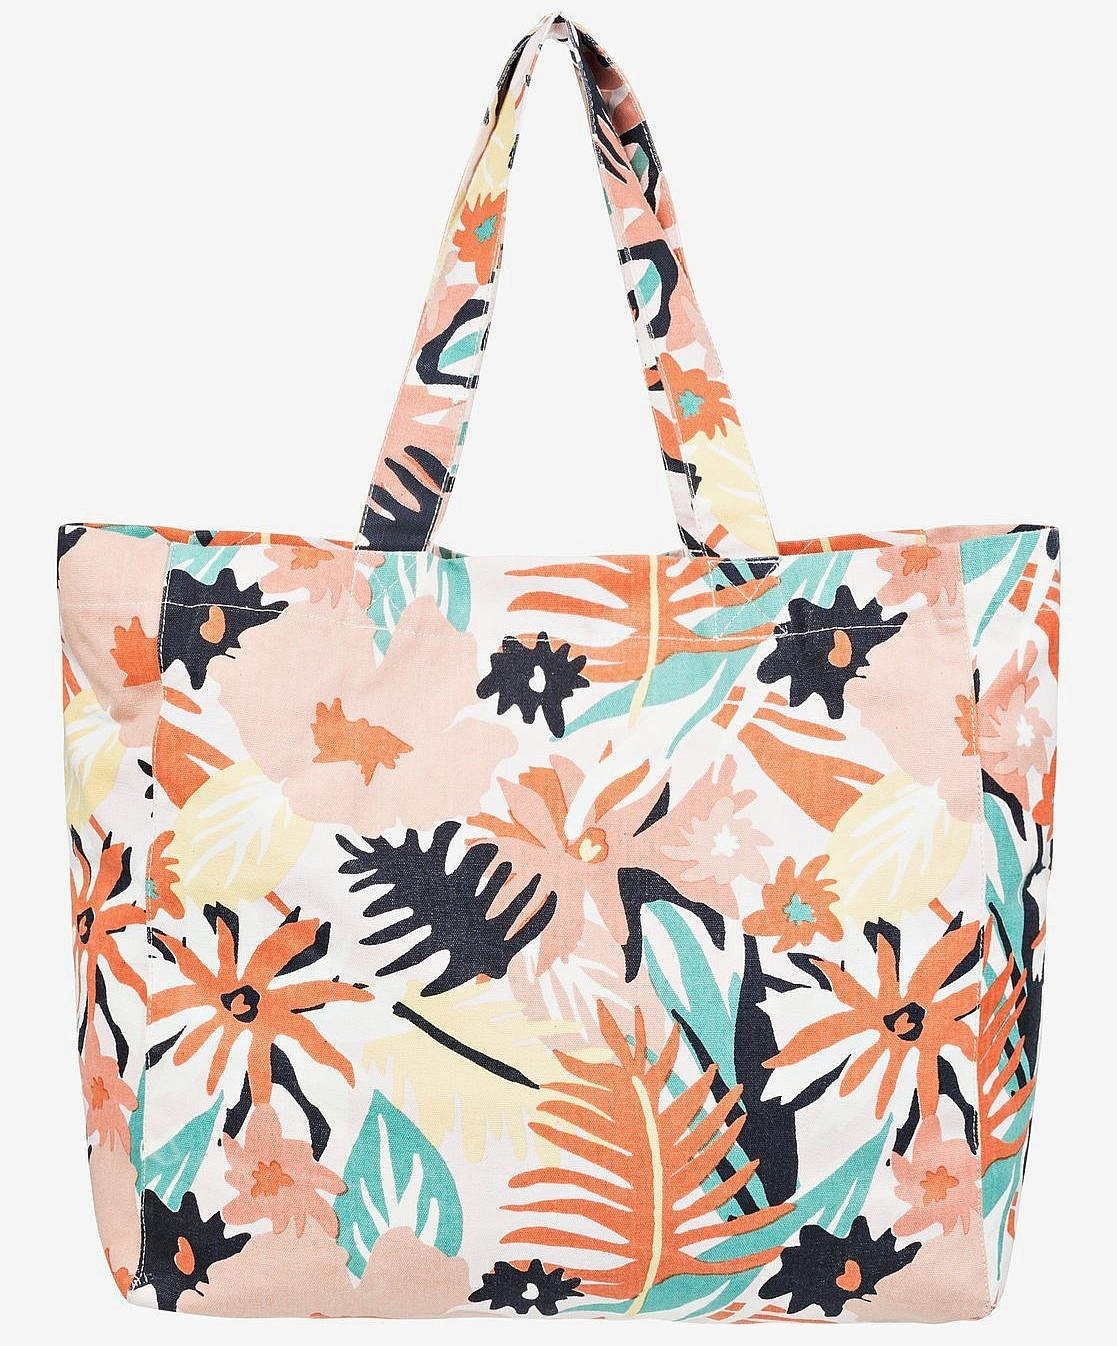 bag Roxy Anti Bad Vibes Printed - MDT8/Peach Blush Bright Skies - women´s